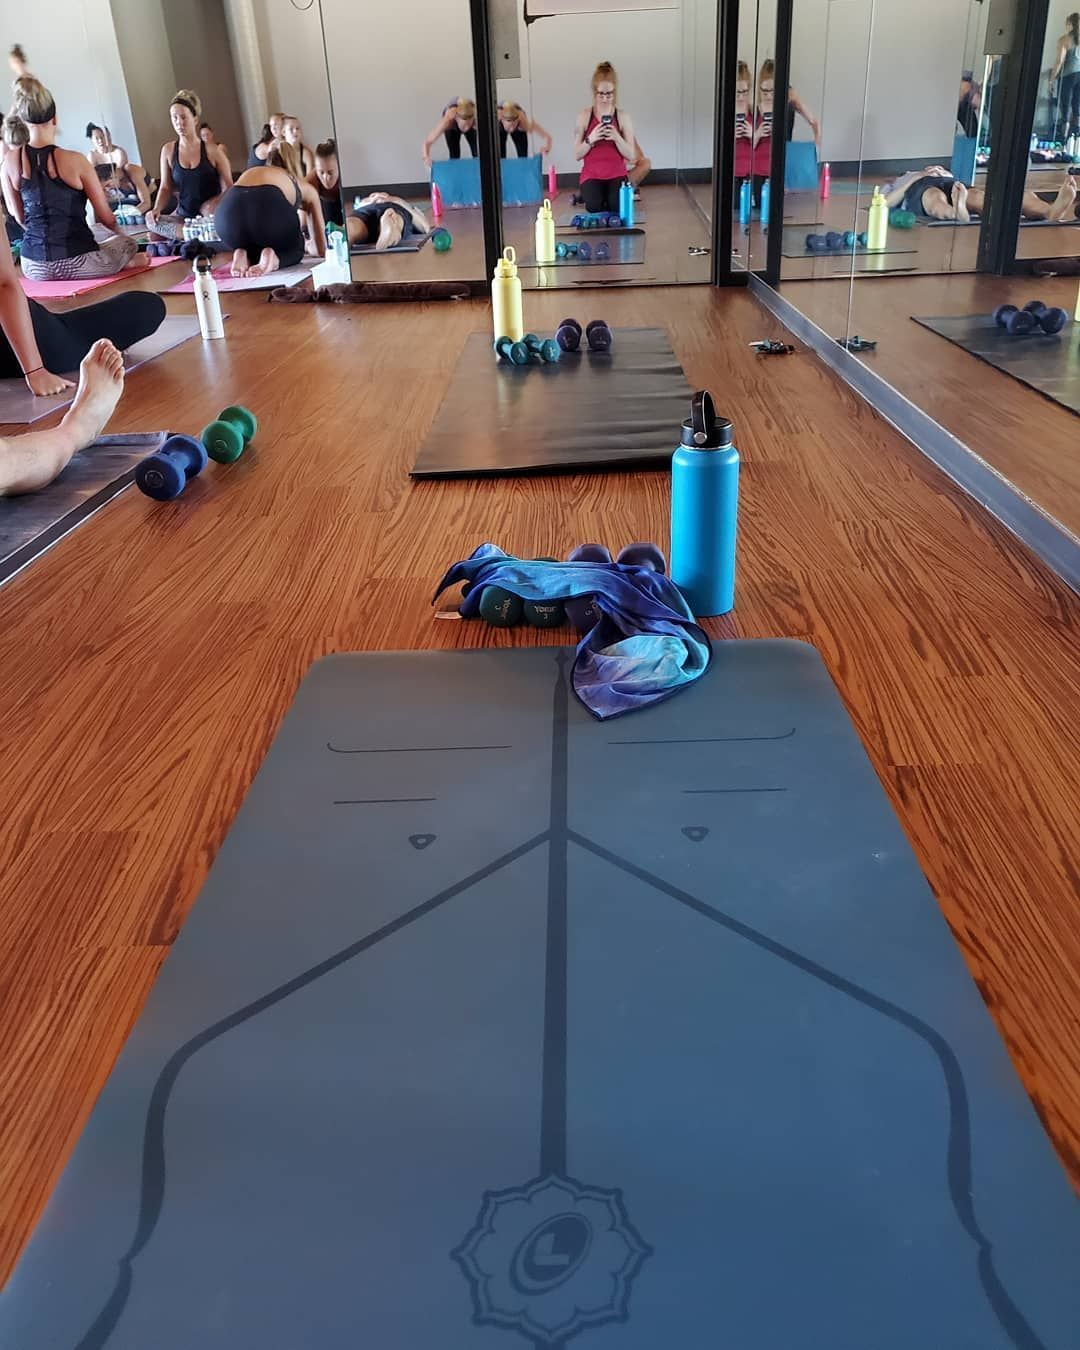 #halfmarathontraining #yogasculpt #pretending #physically #something #saturday #teaching #marathon #...